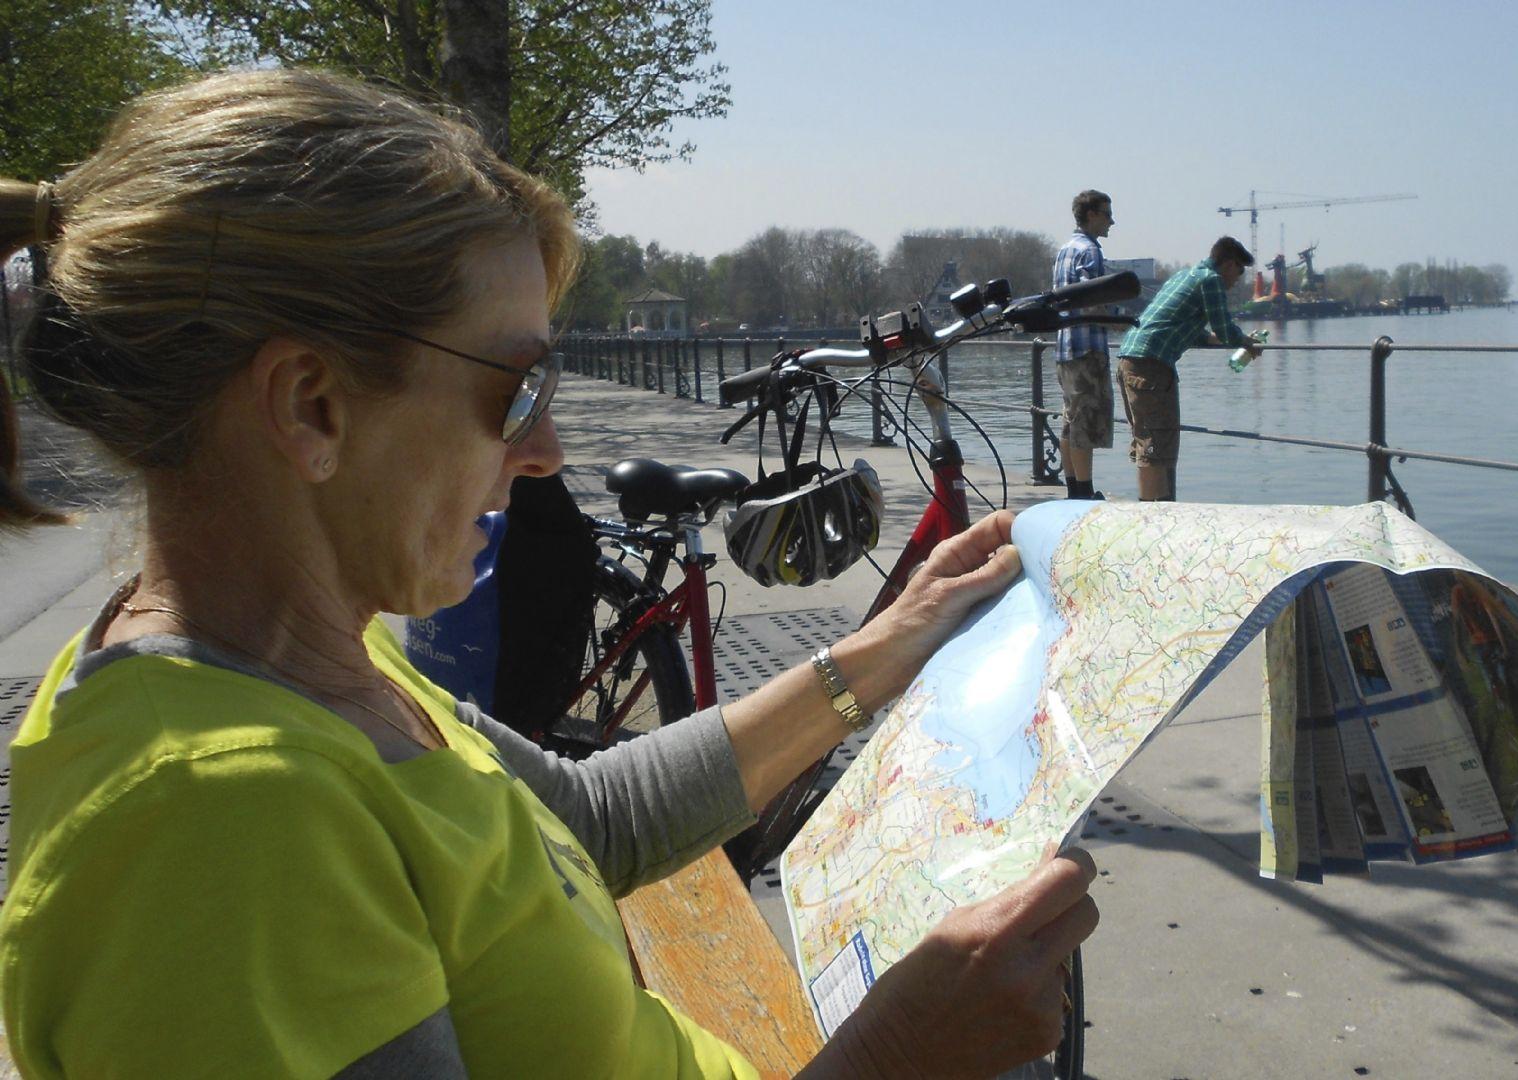 leisurecyclingaustria6.jpg - Austria - Ten Lakes Tour - Self-Guided Leisure Cycling Holiday - Leisure Cycling